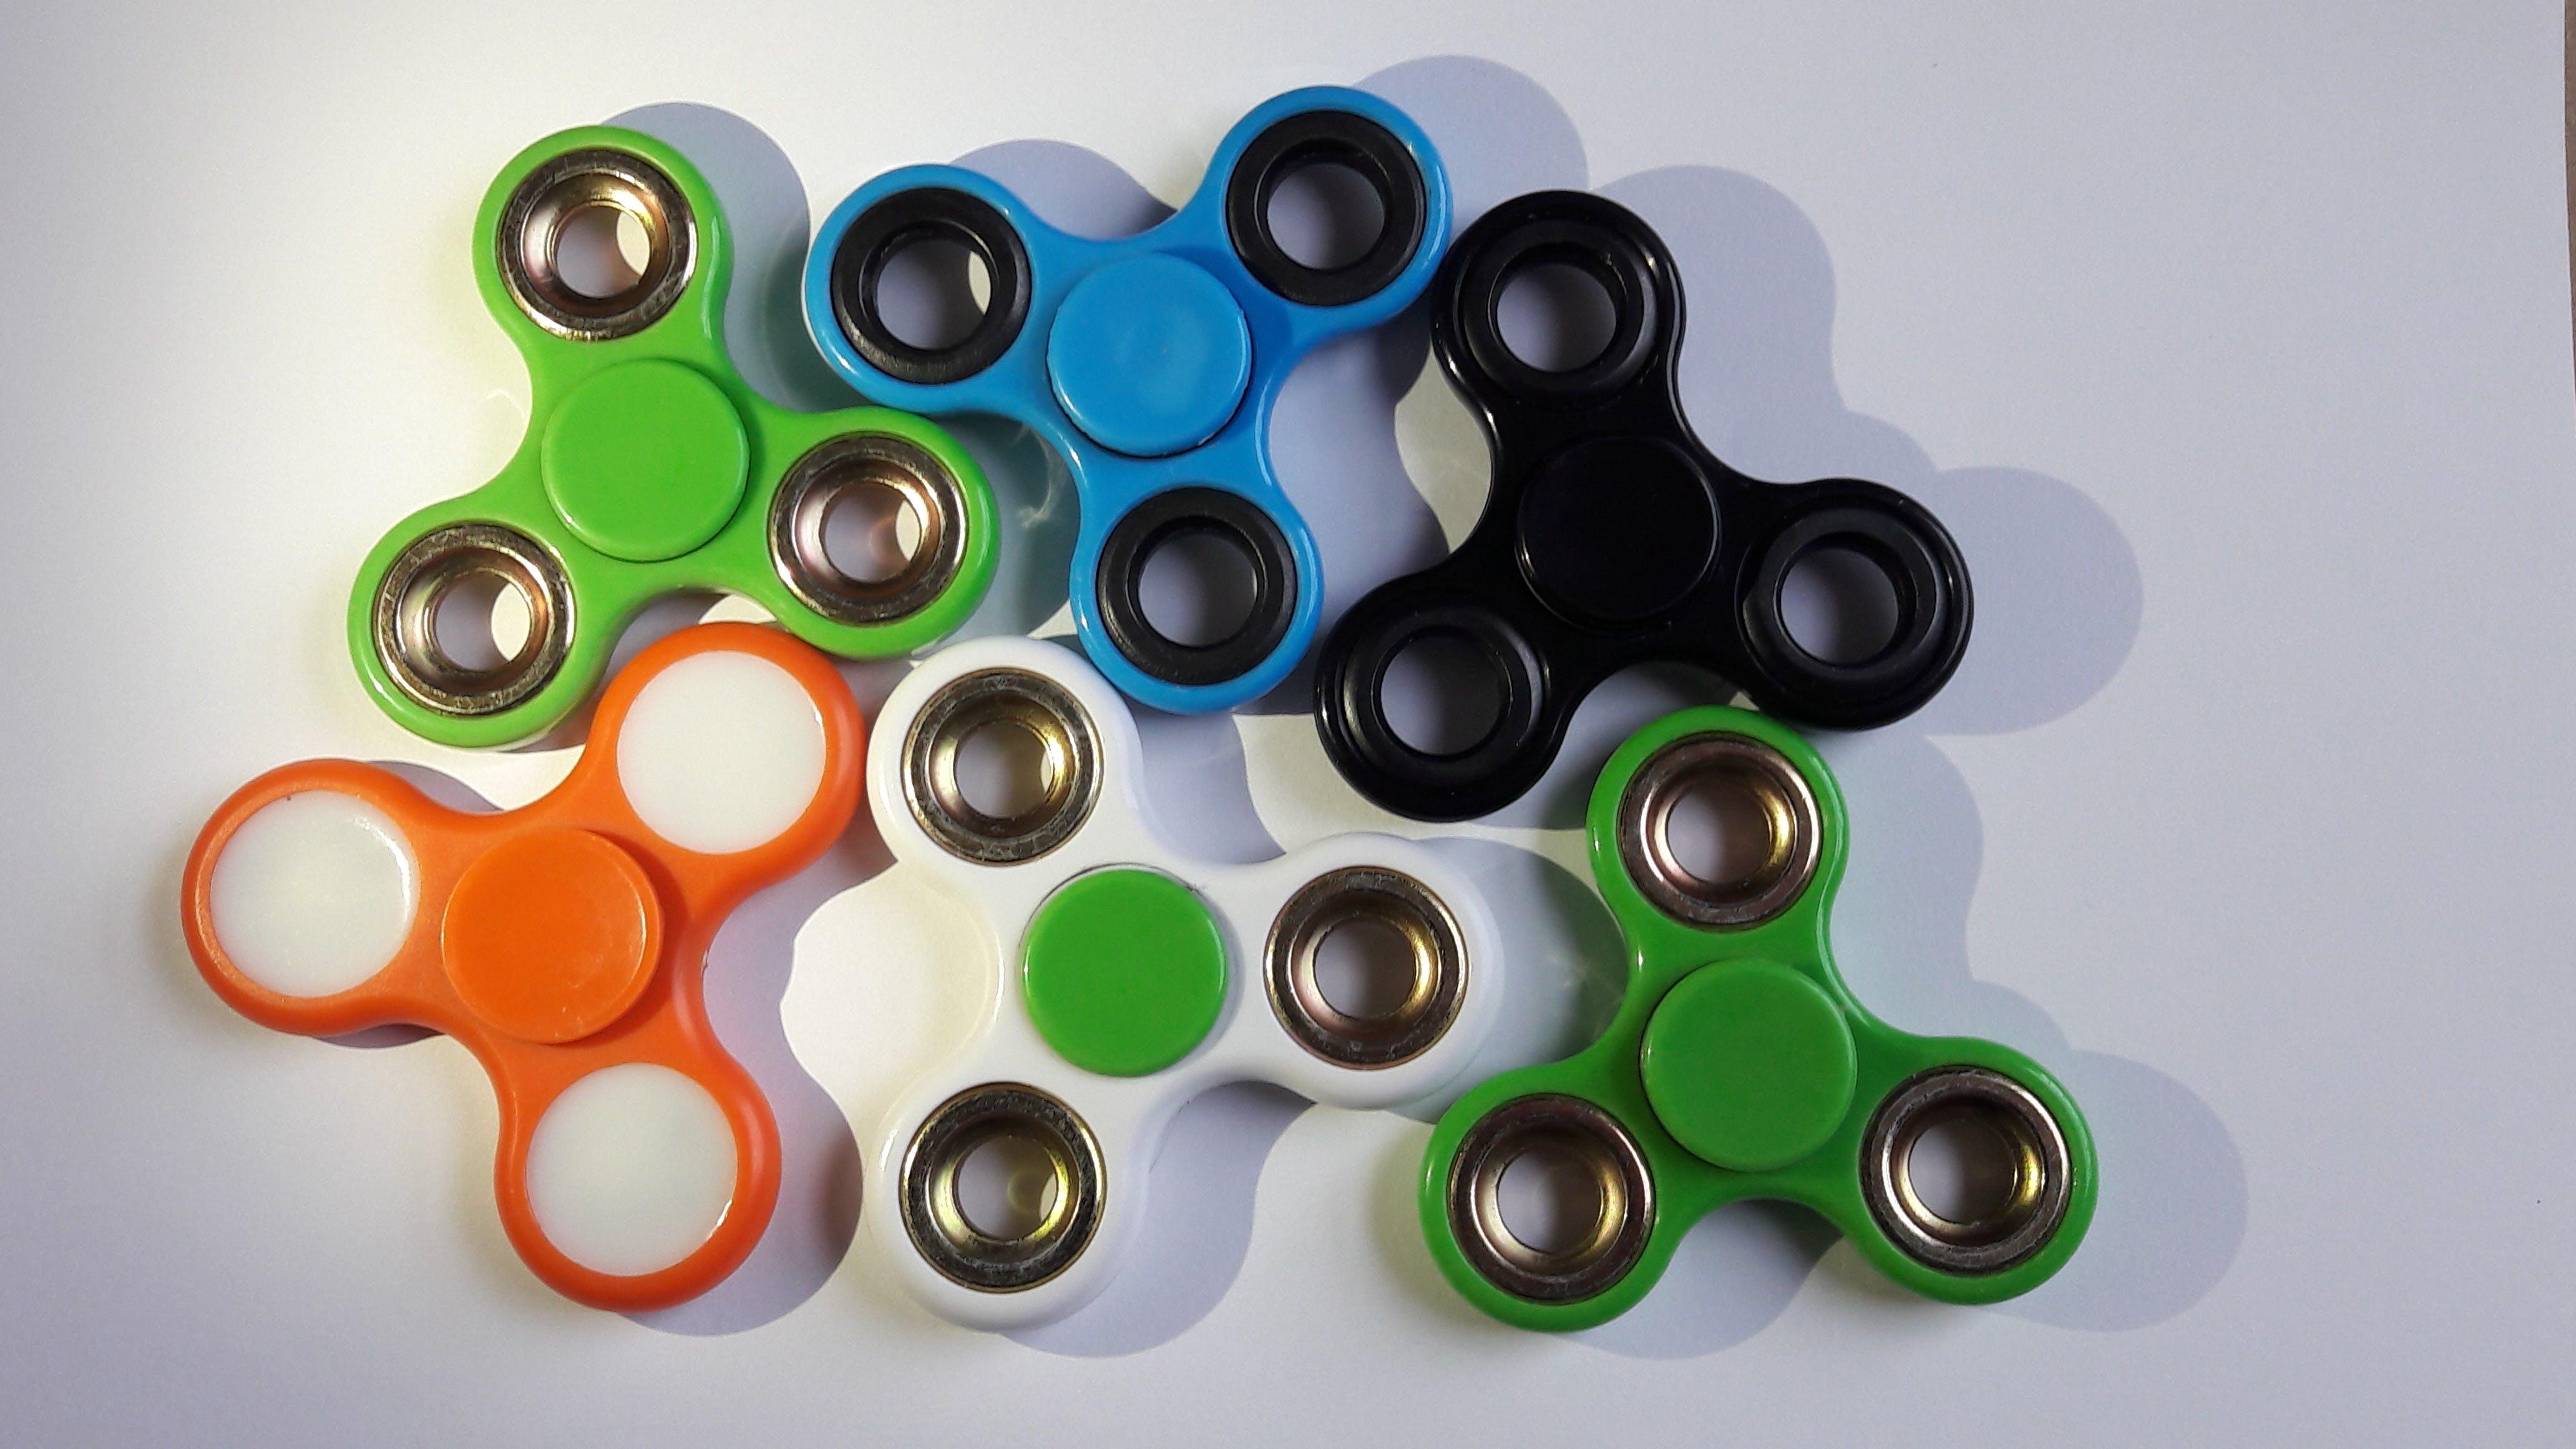 Free stock photo of fidget spinner